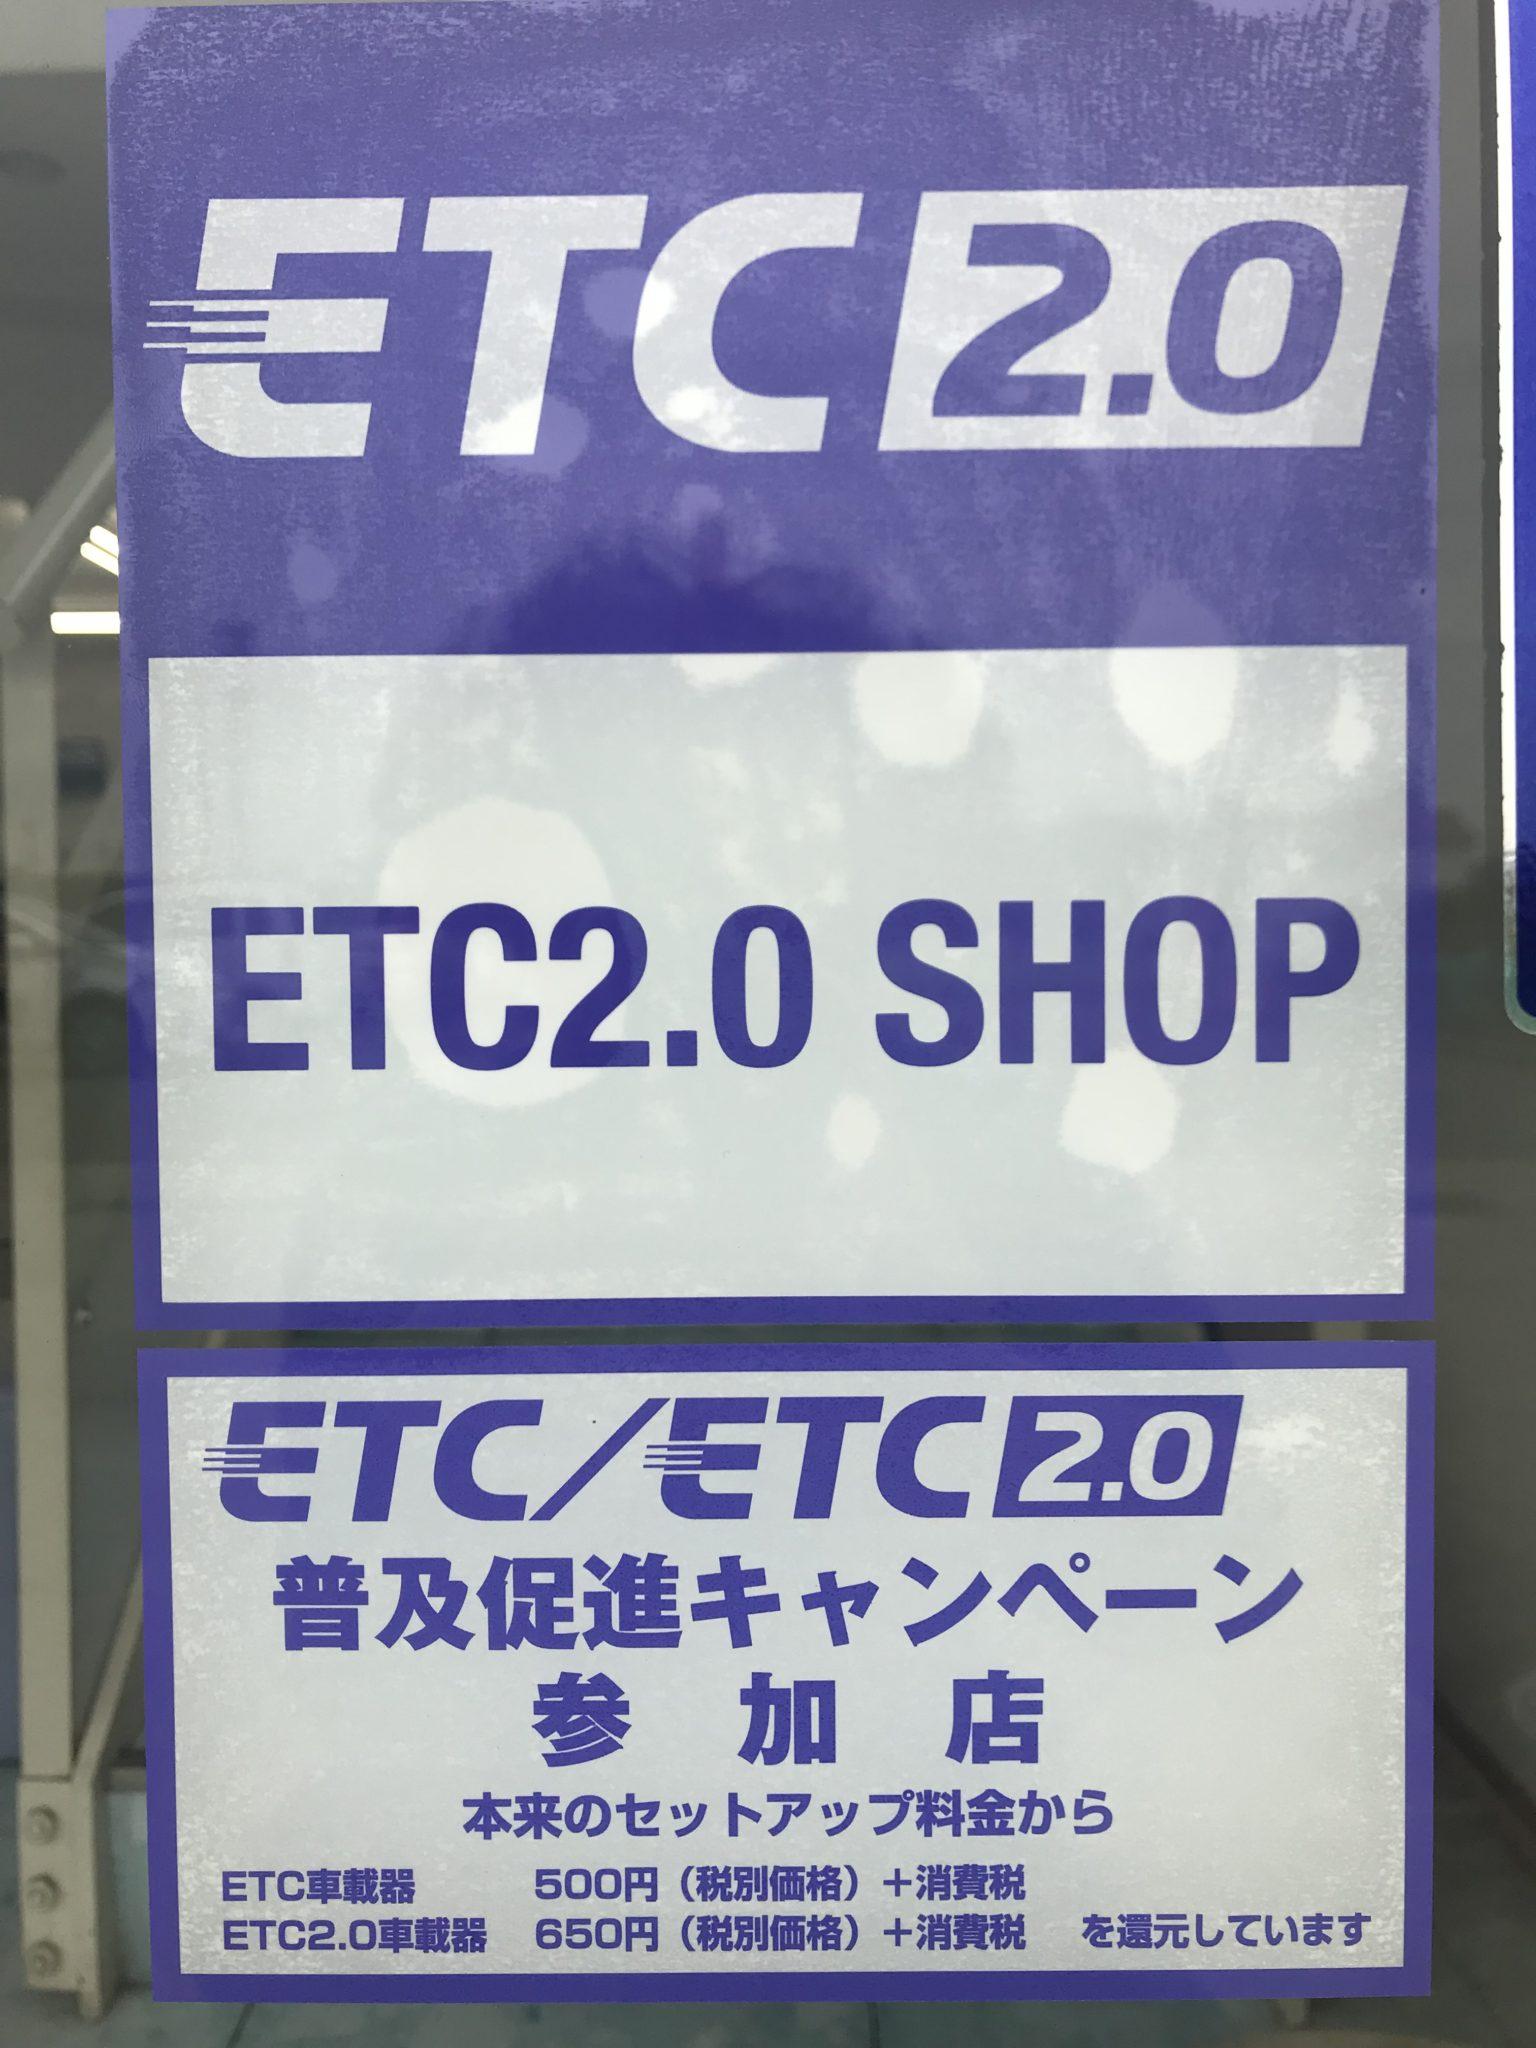 Etc セットアップ 料金